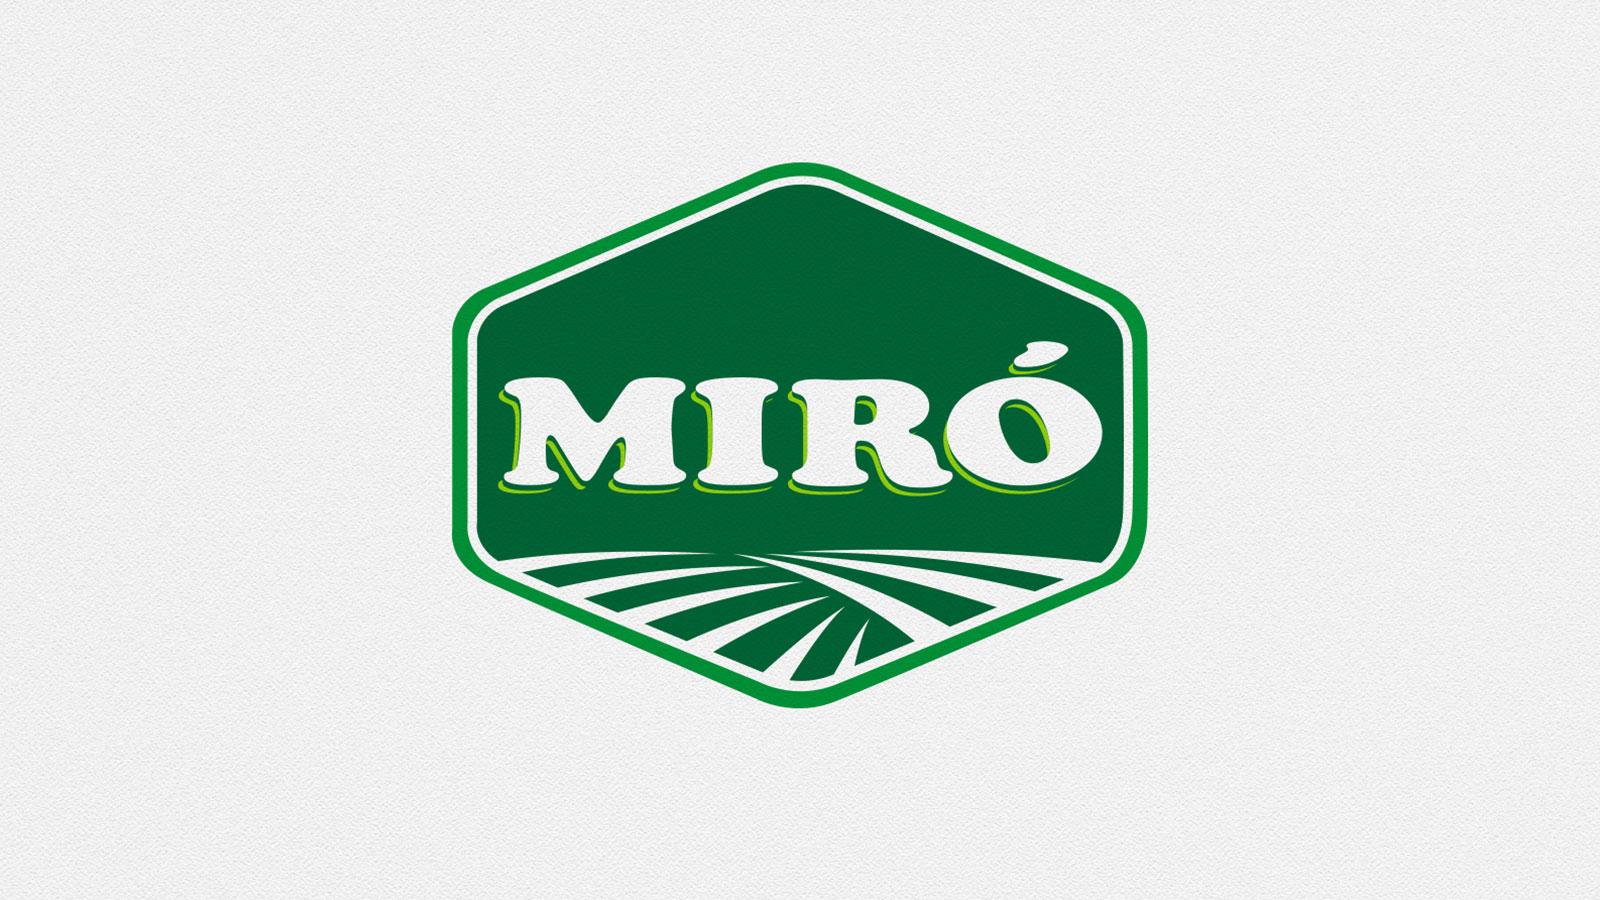 Arroz-Miro-N-01